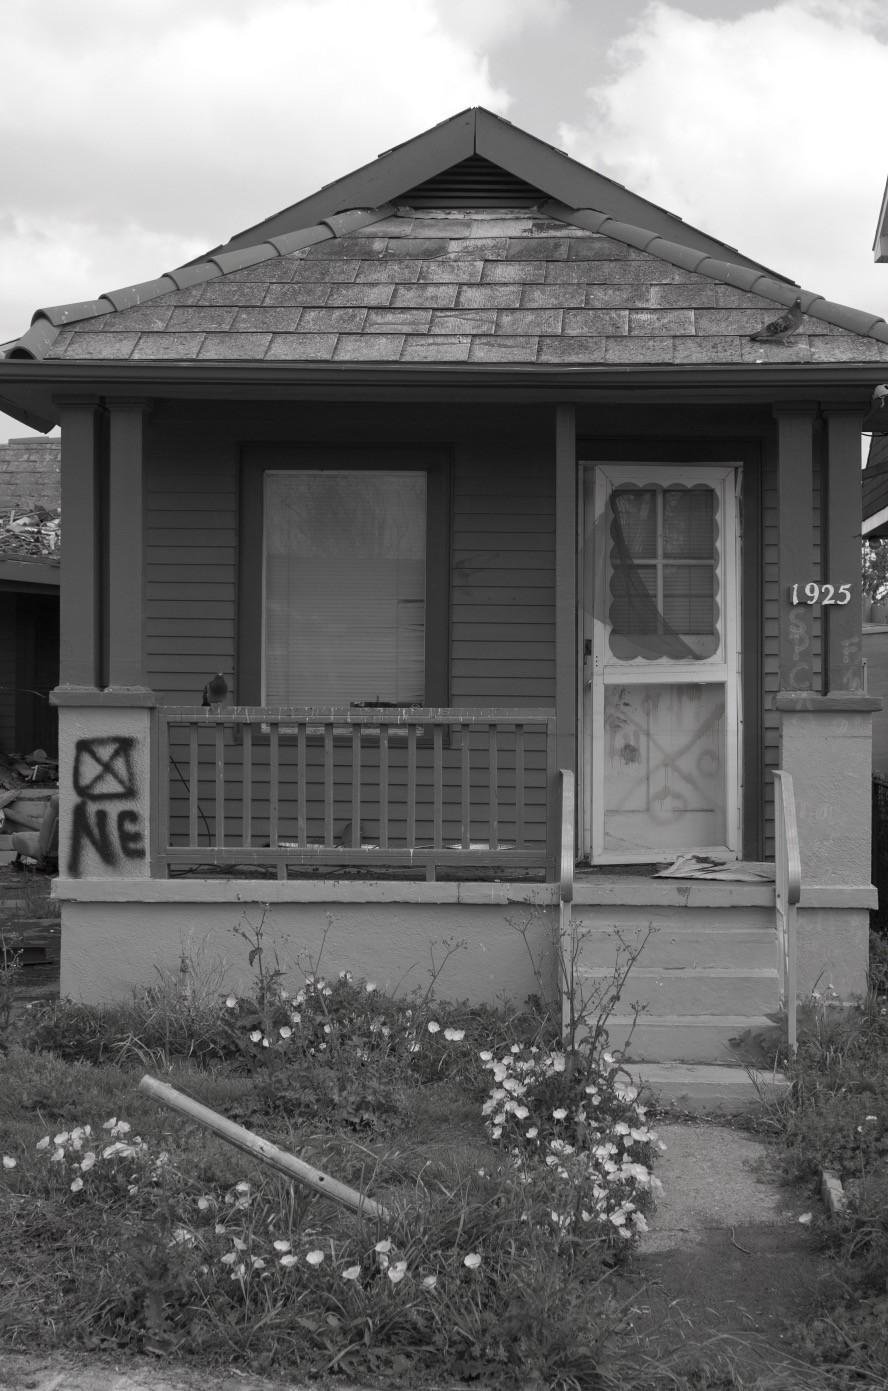 A shotgun house, much like Solomon Gregory's